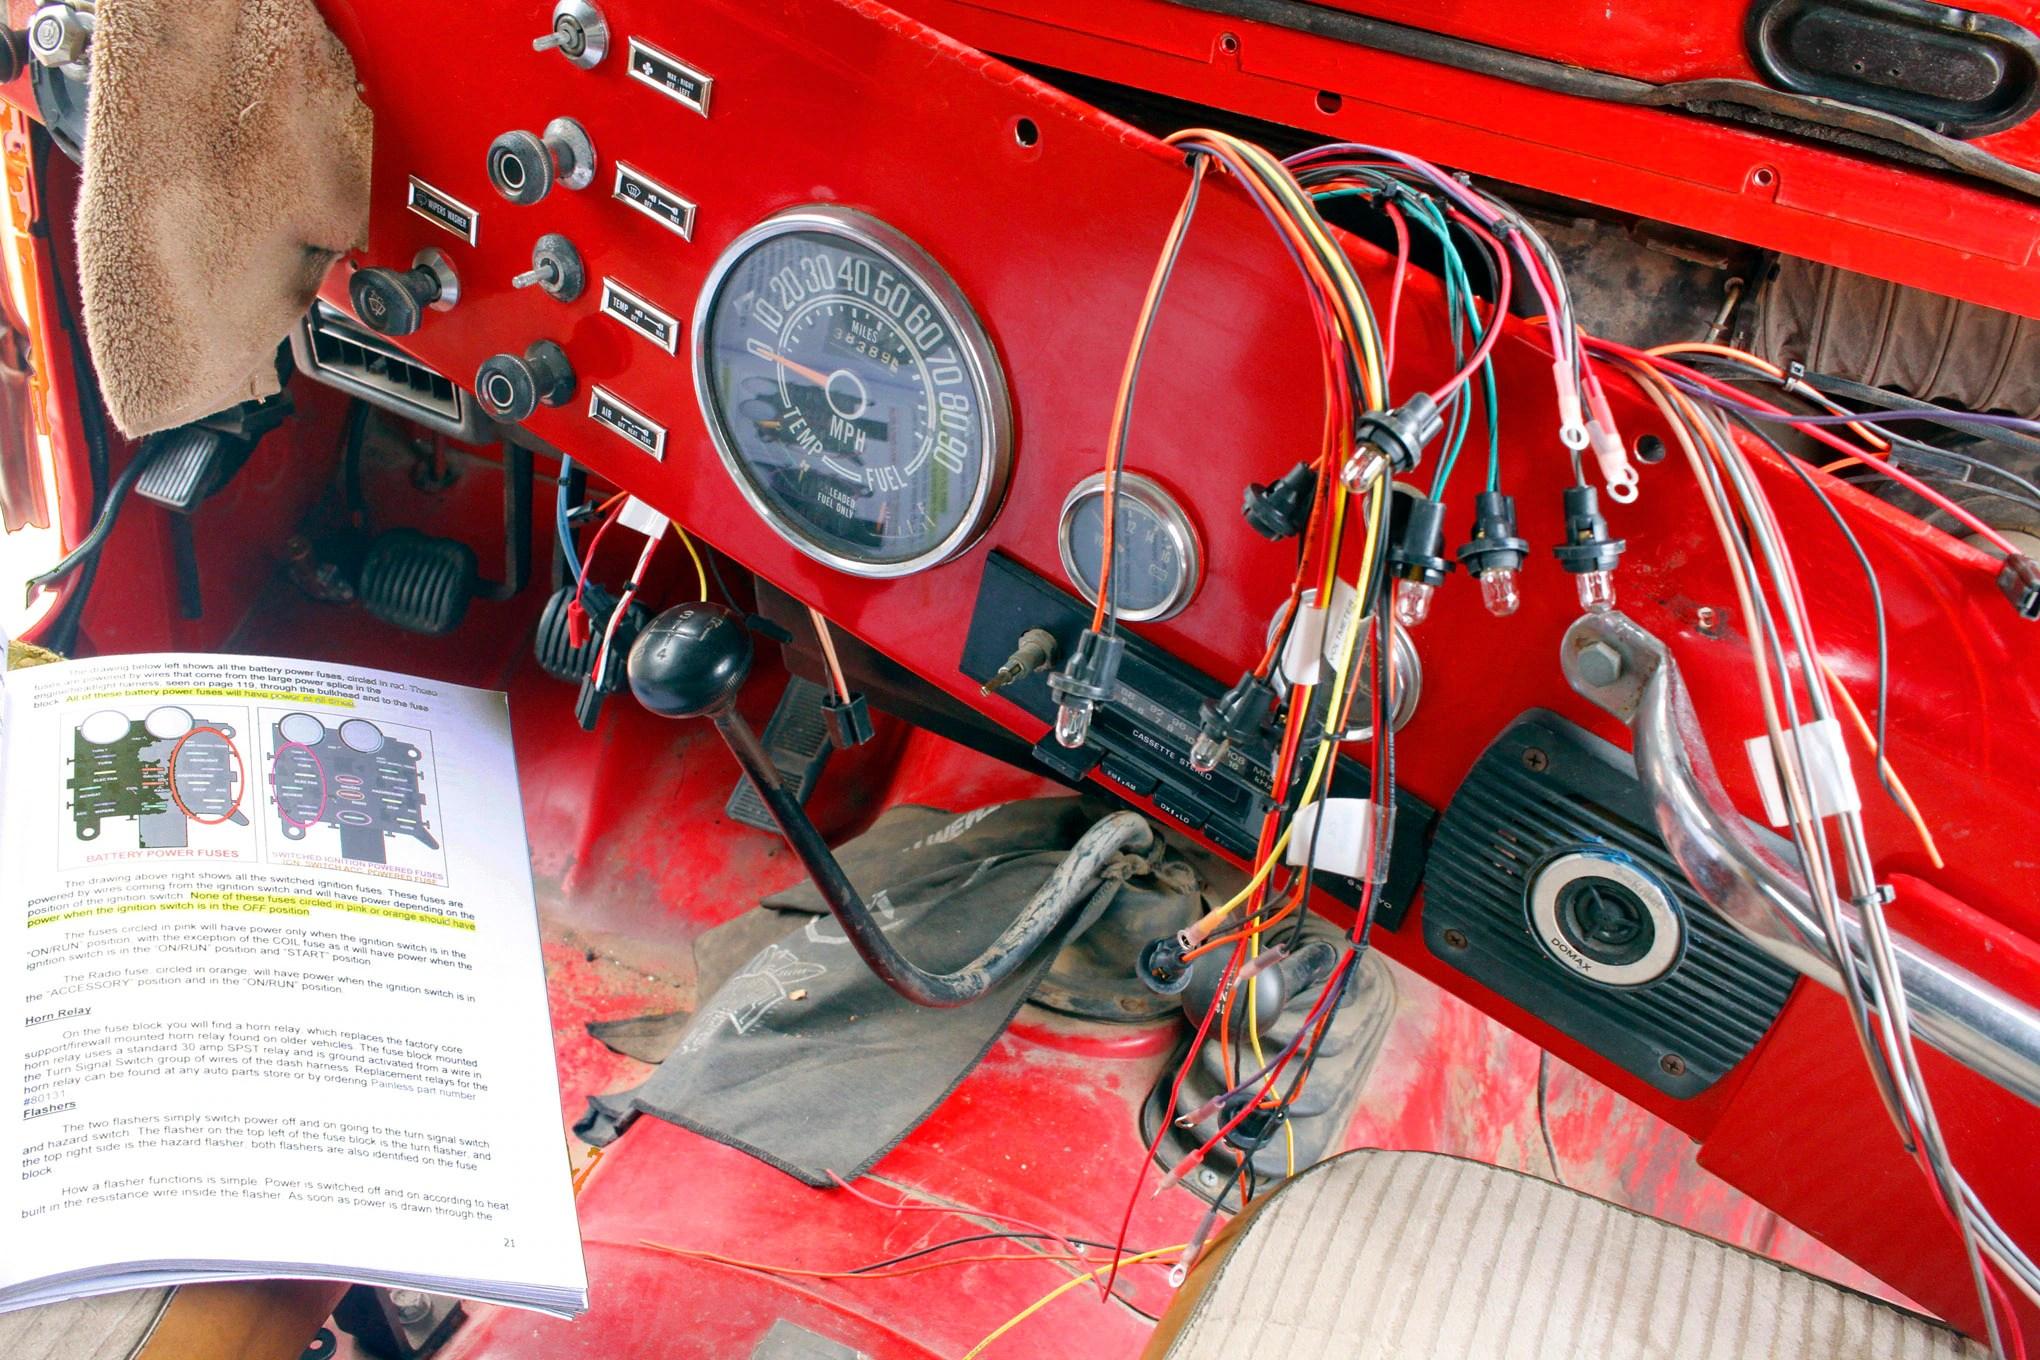 hight resolution of cj wiring harness image restore wiring diagram cj wiring harness image restore